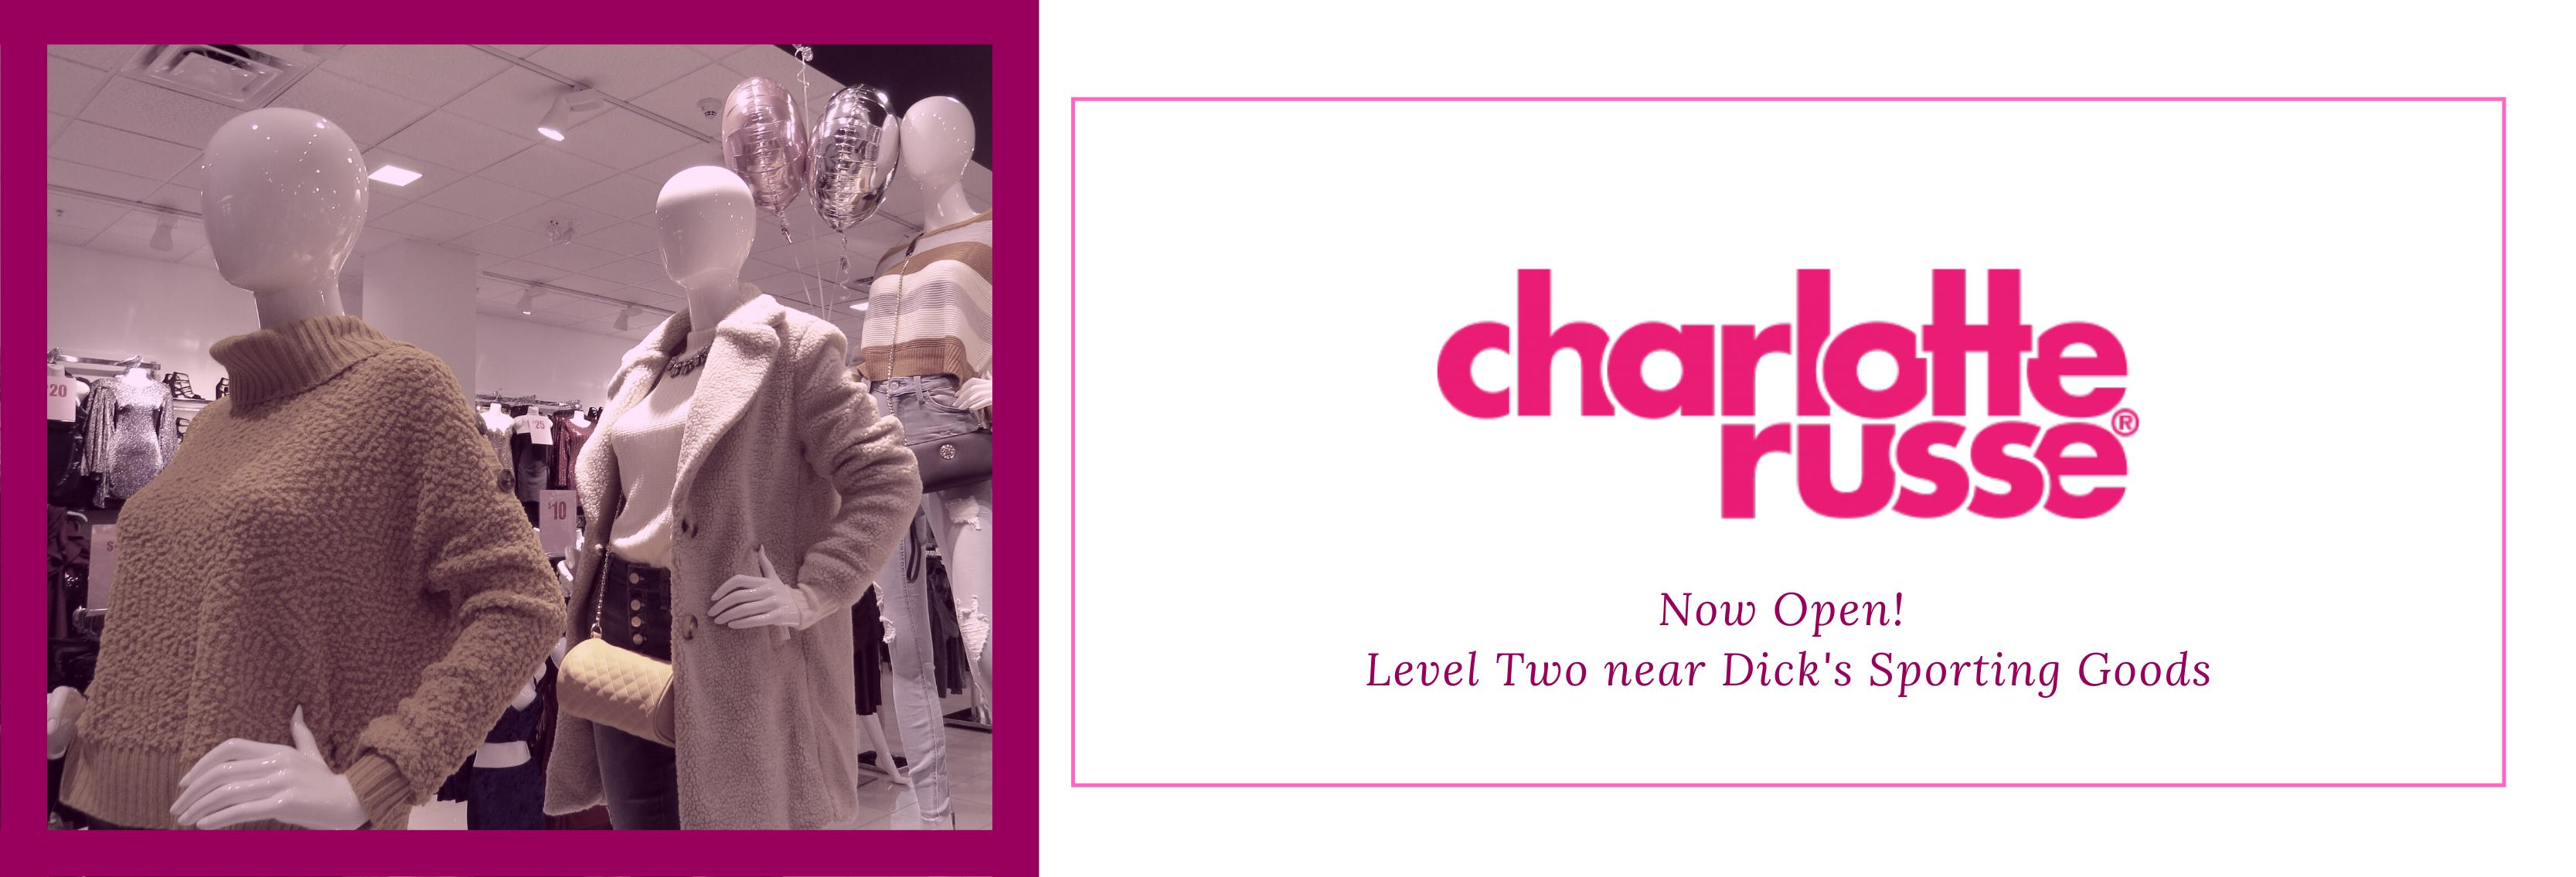 Charlotte Russe Slider 11052019